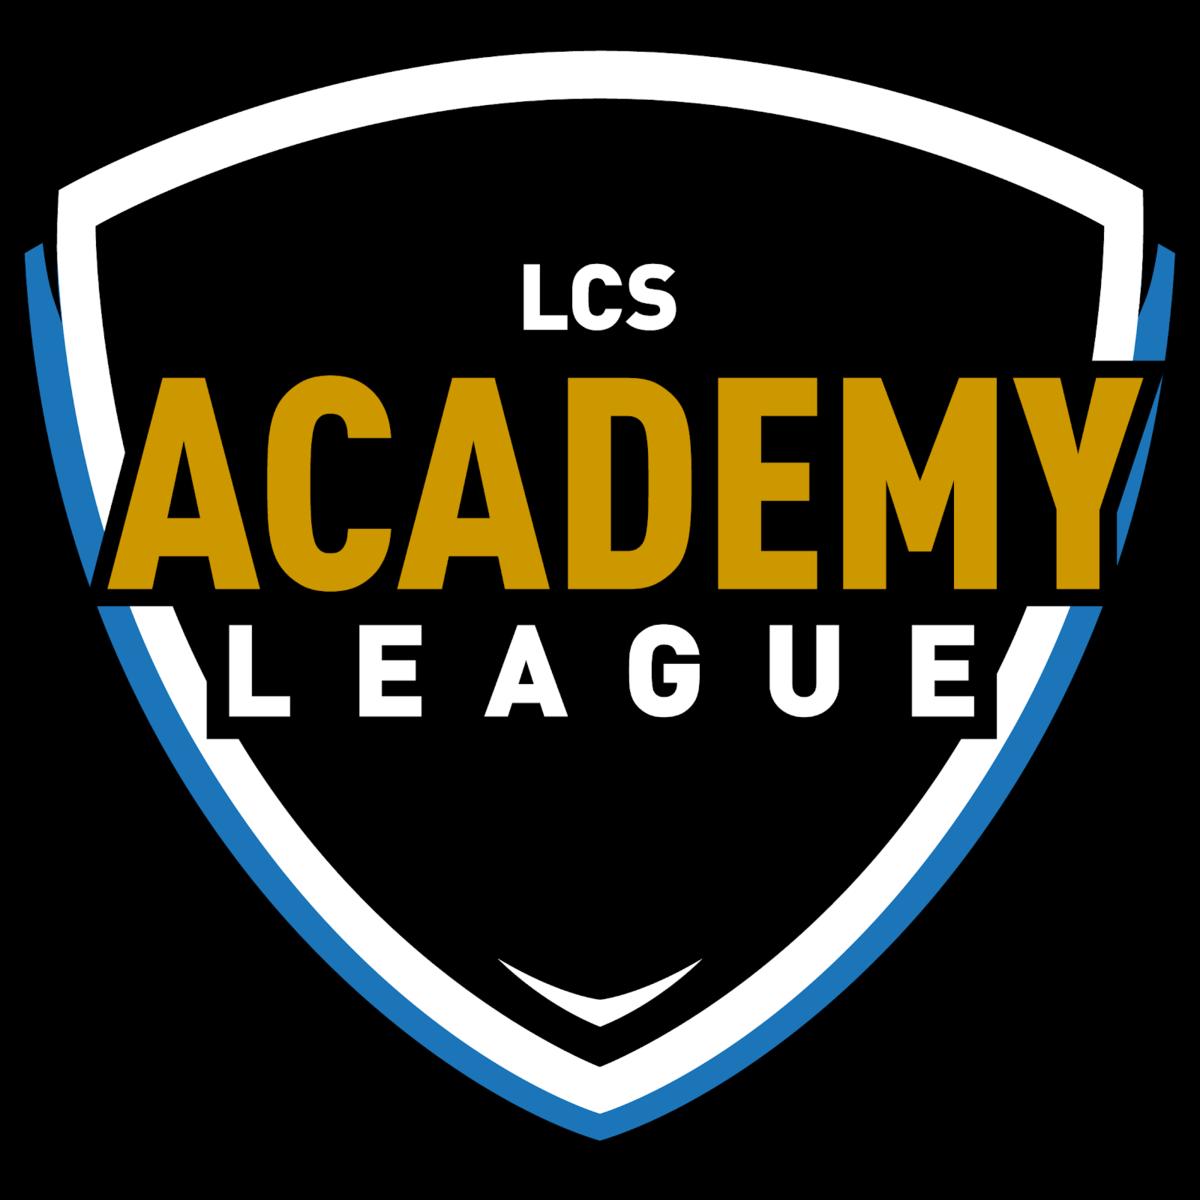 NA Academy 2019 Spring - Leaguepedia | League of Legends